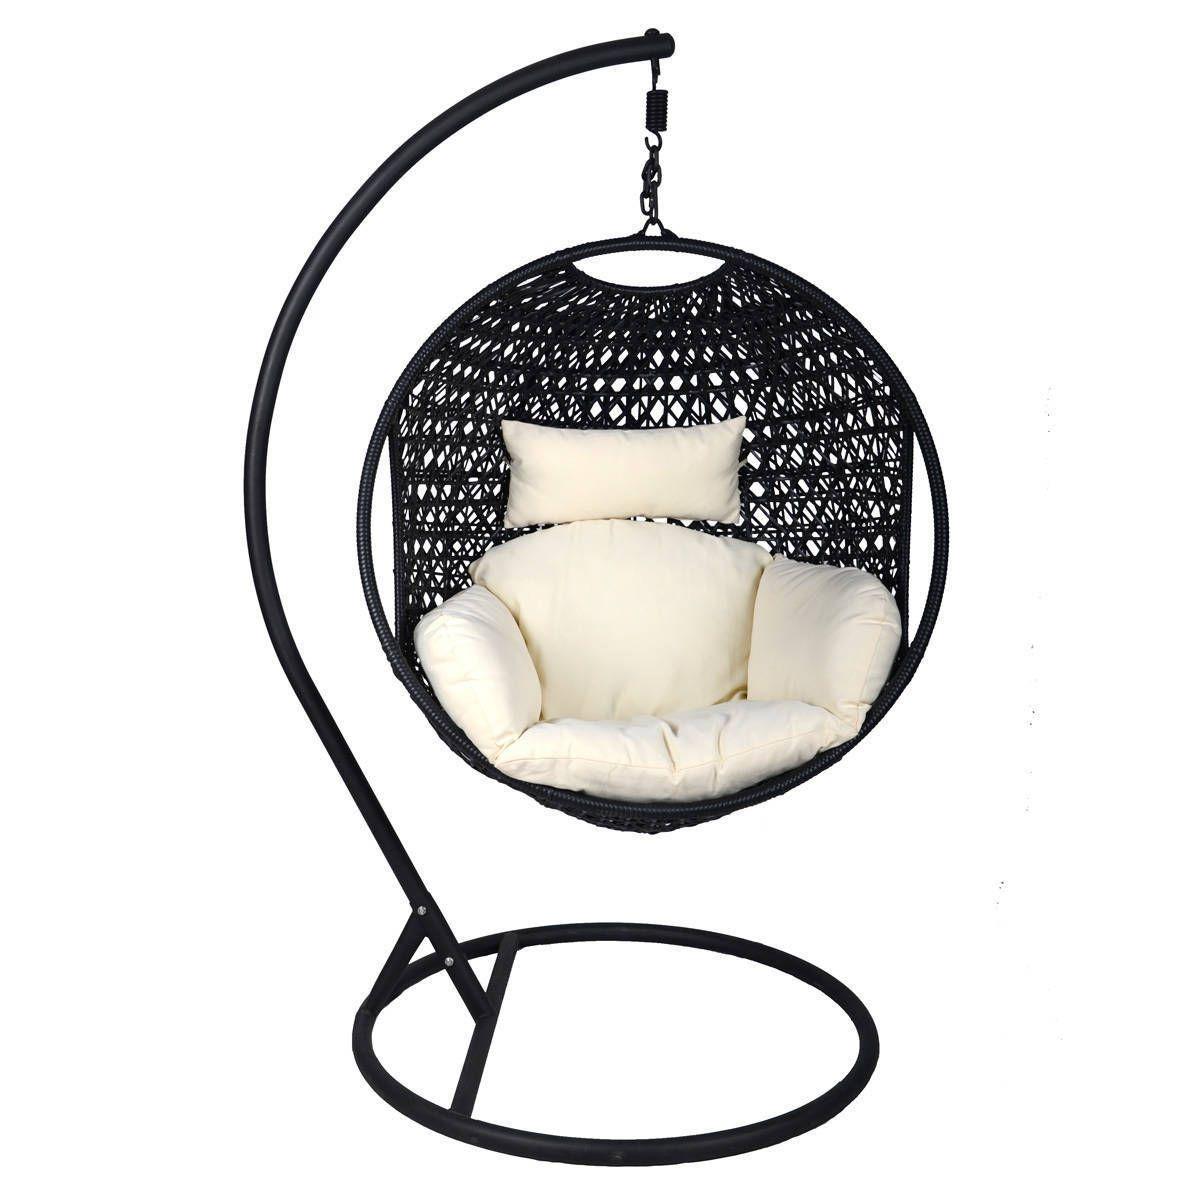 Charles bentley garden black rattan pod swing chair swinging chair